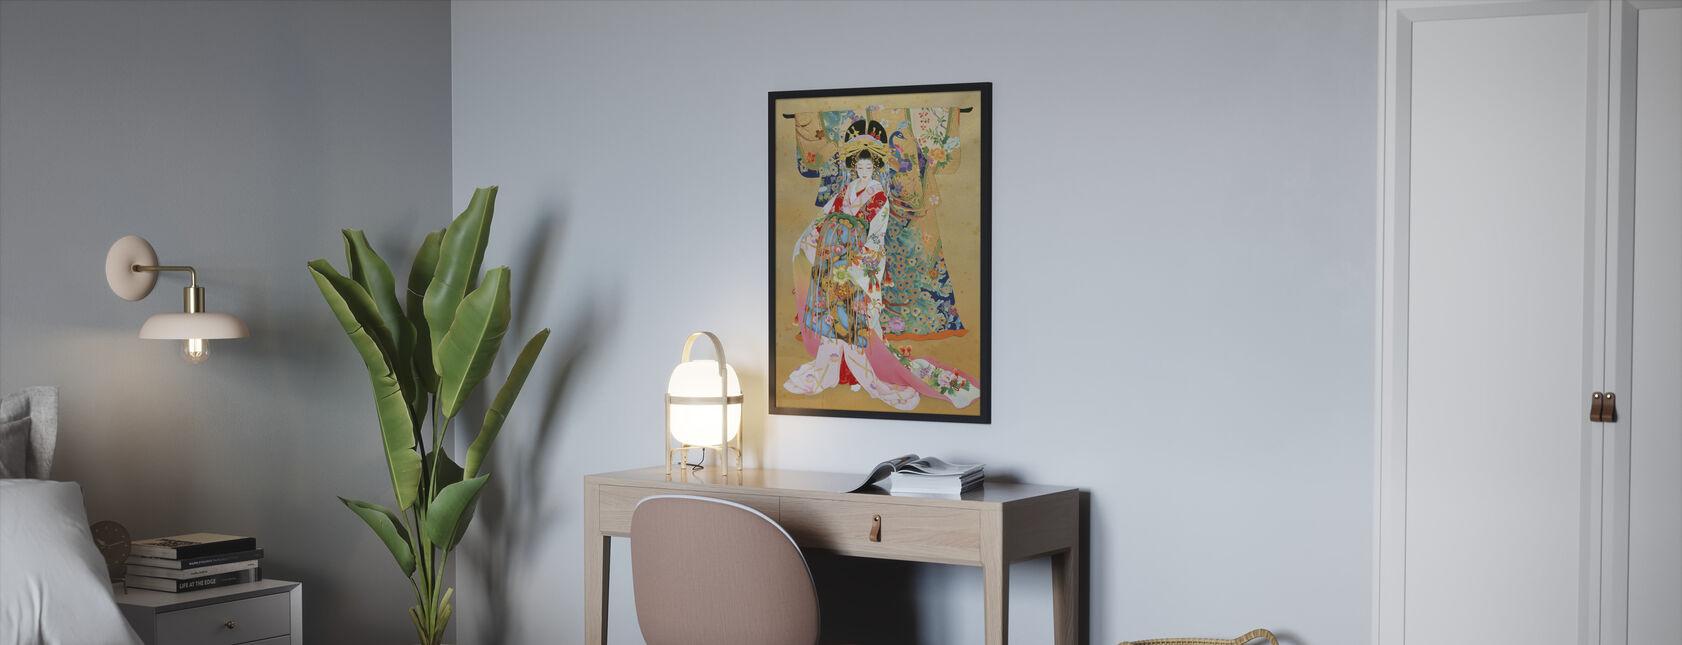 Kogane - Ingelijste print - Slaapkamer